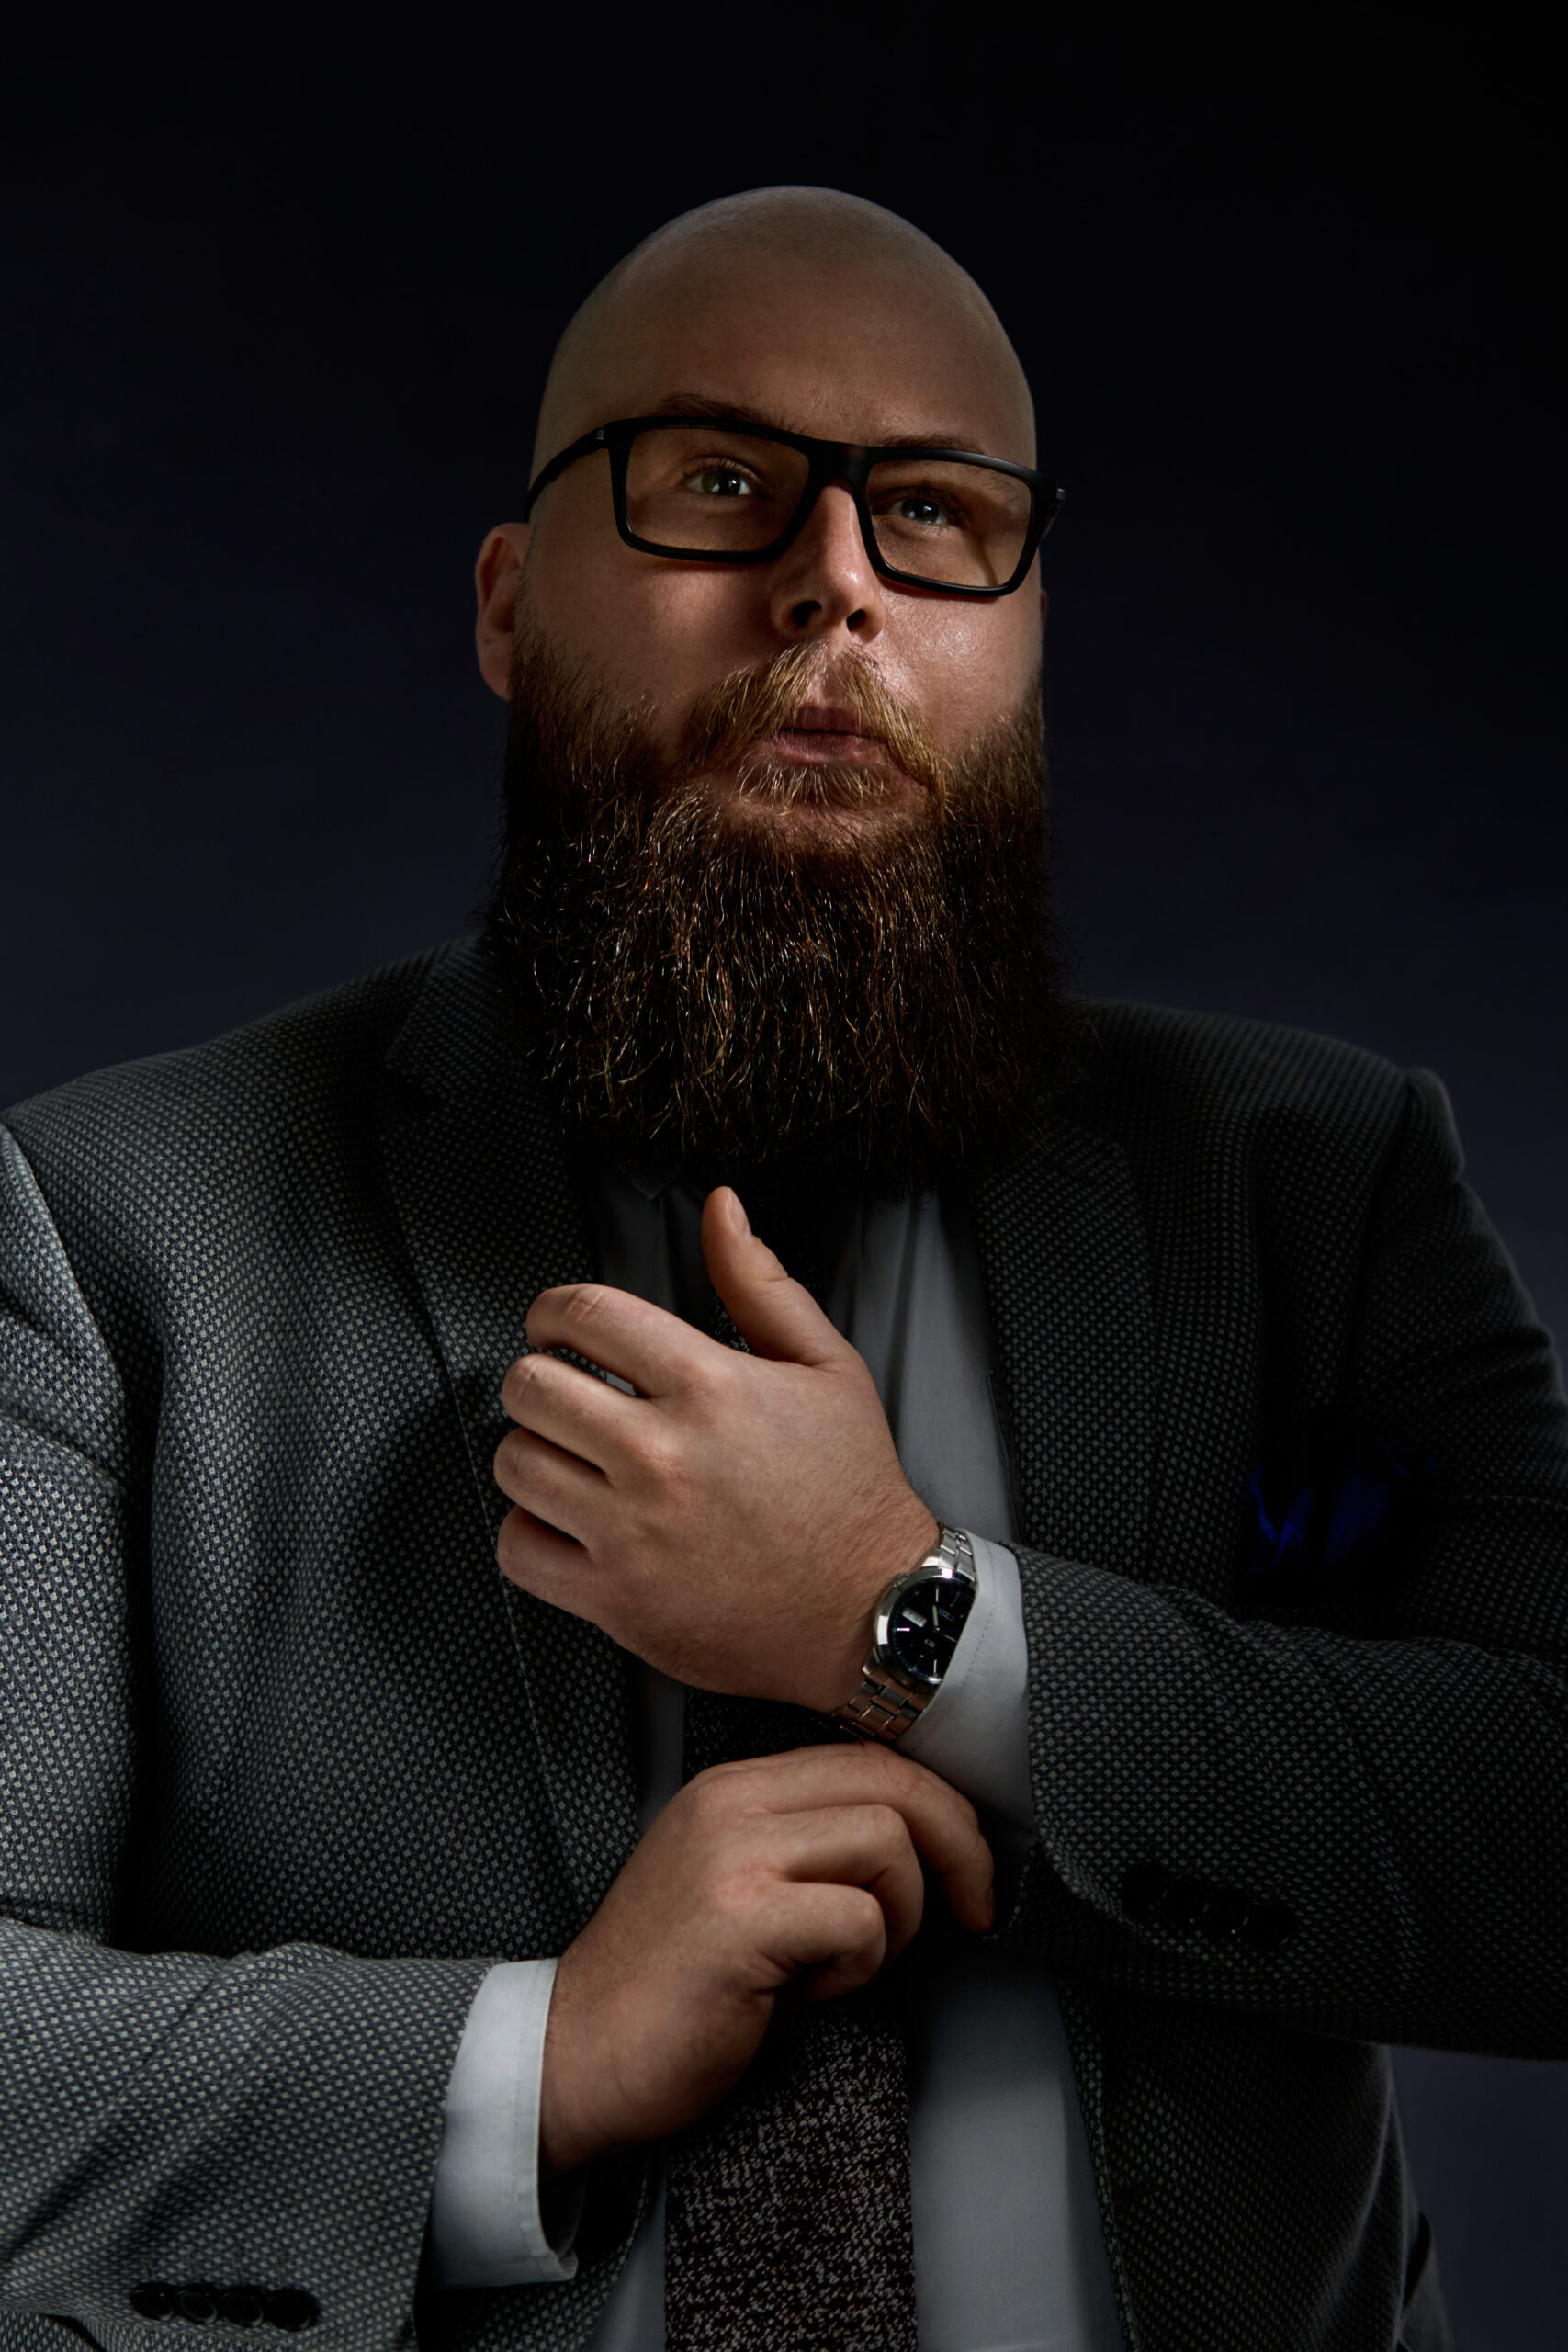 Piotr Chomczyk